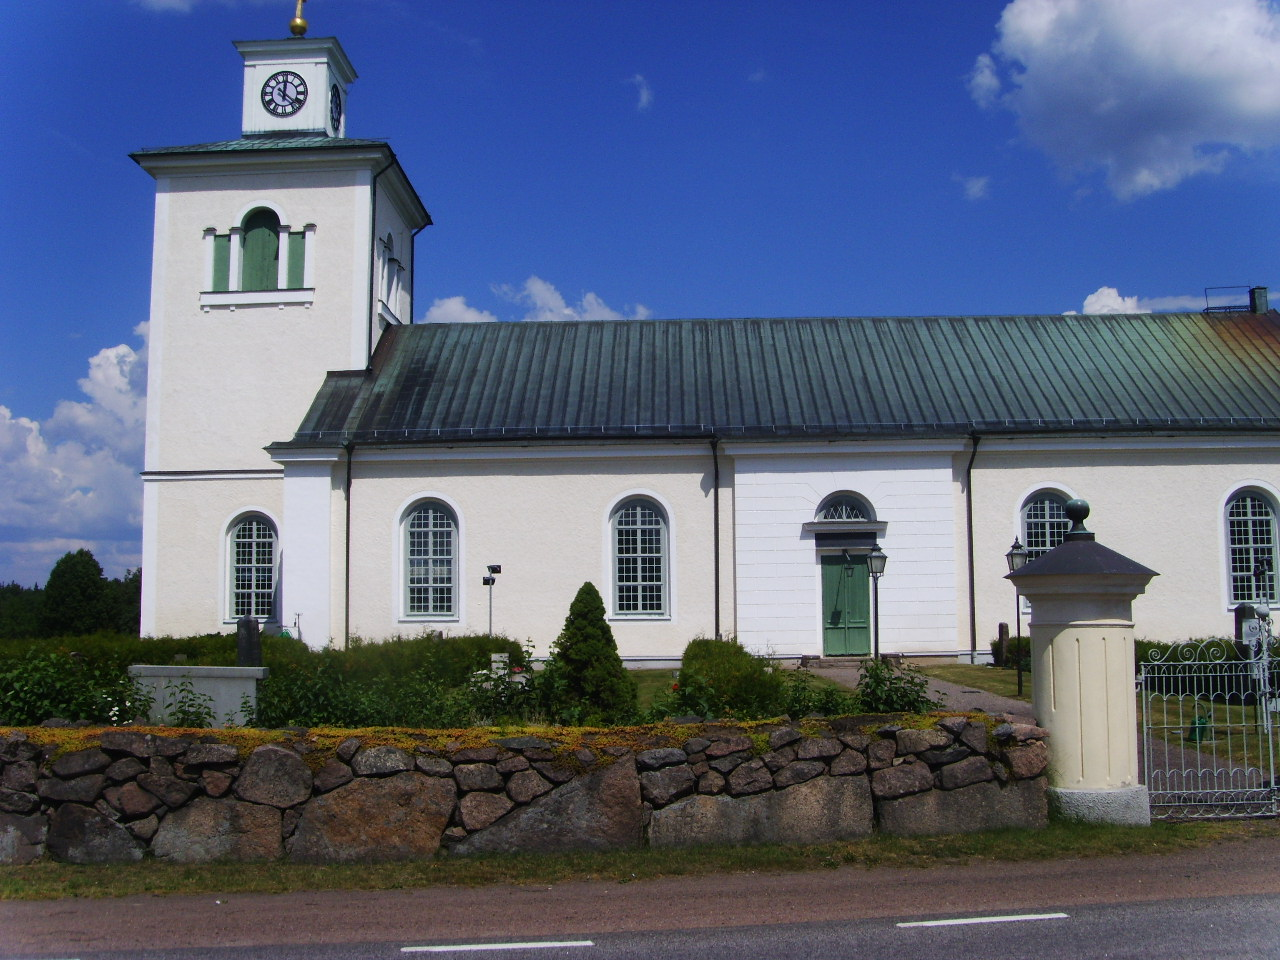 Grdveda - Kalmar lns museum